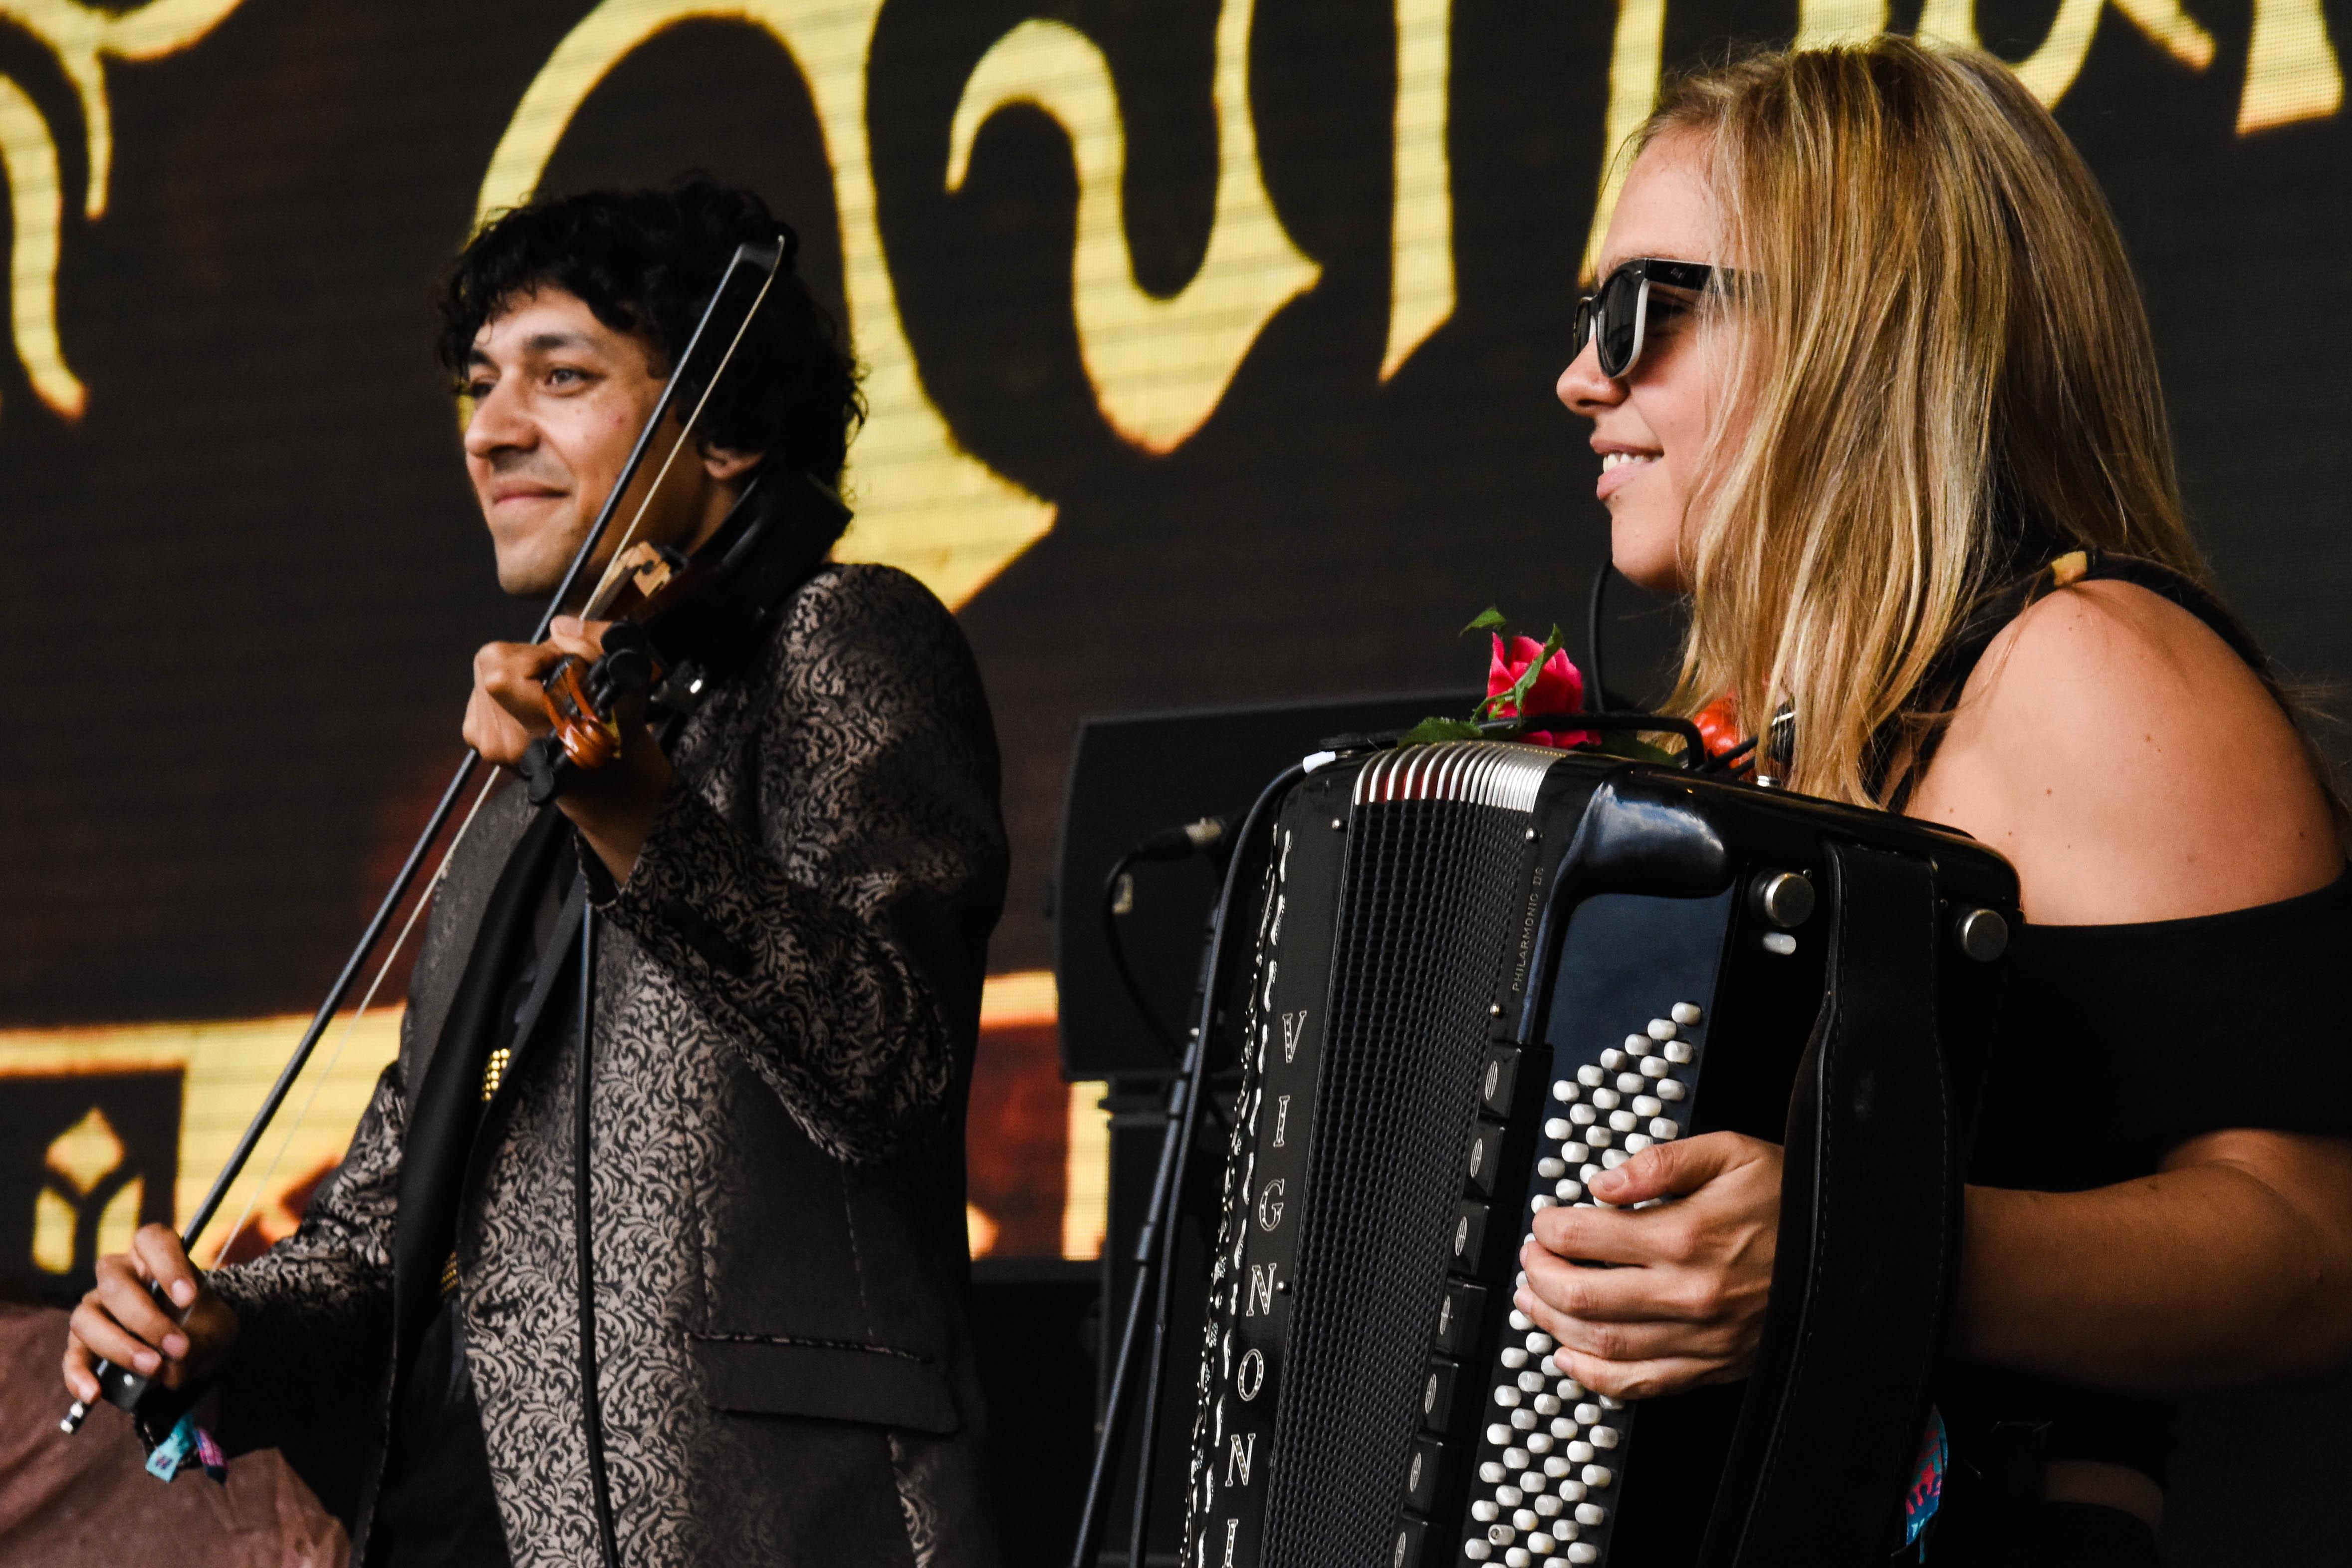 'Faith I Branko' Roma Band